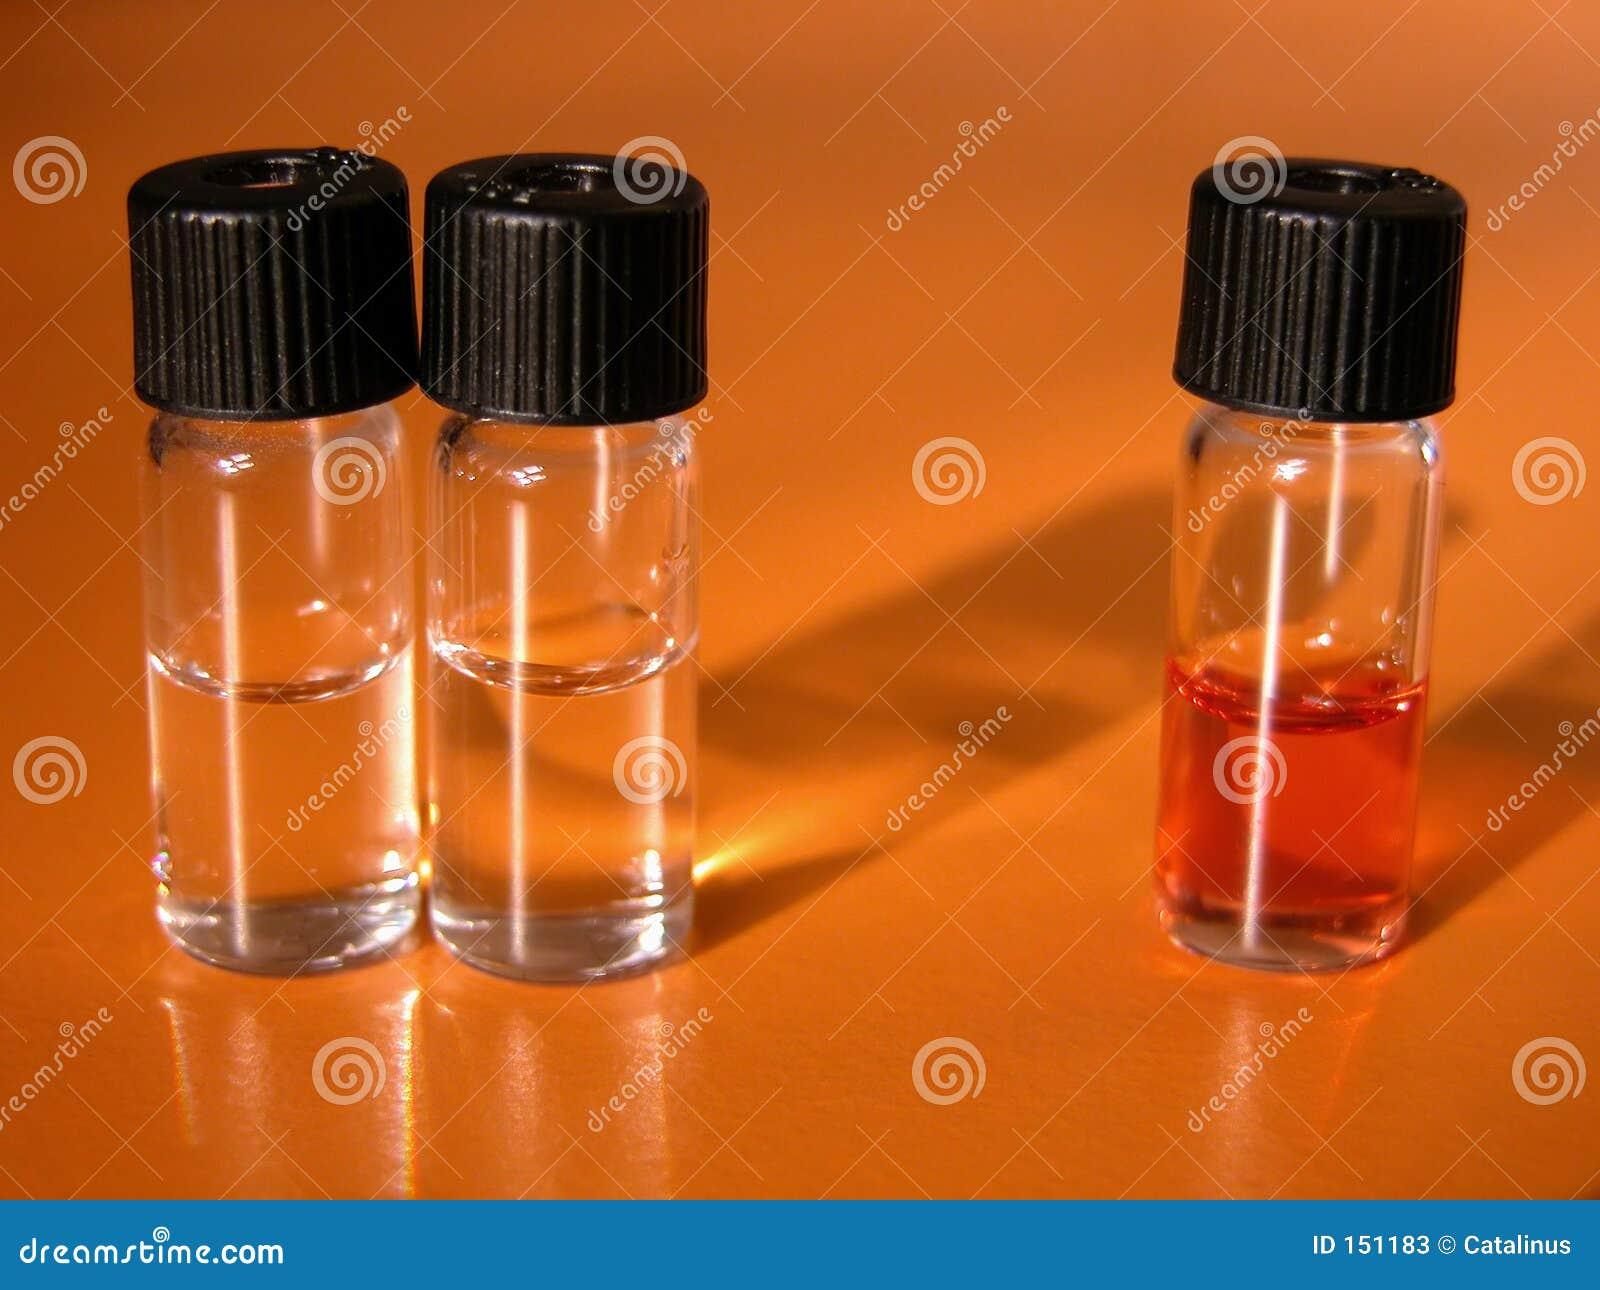 Ciência - Selectivity